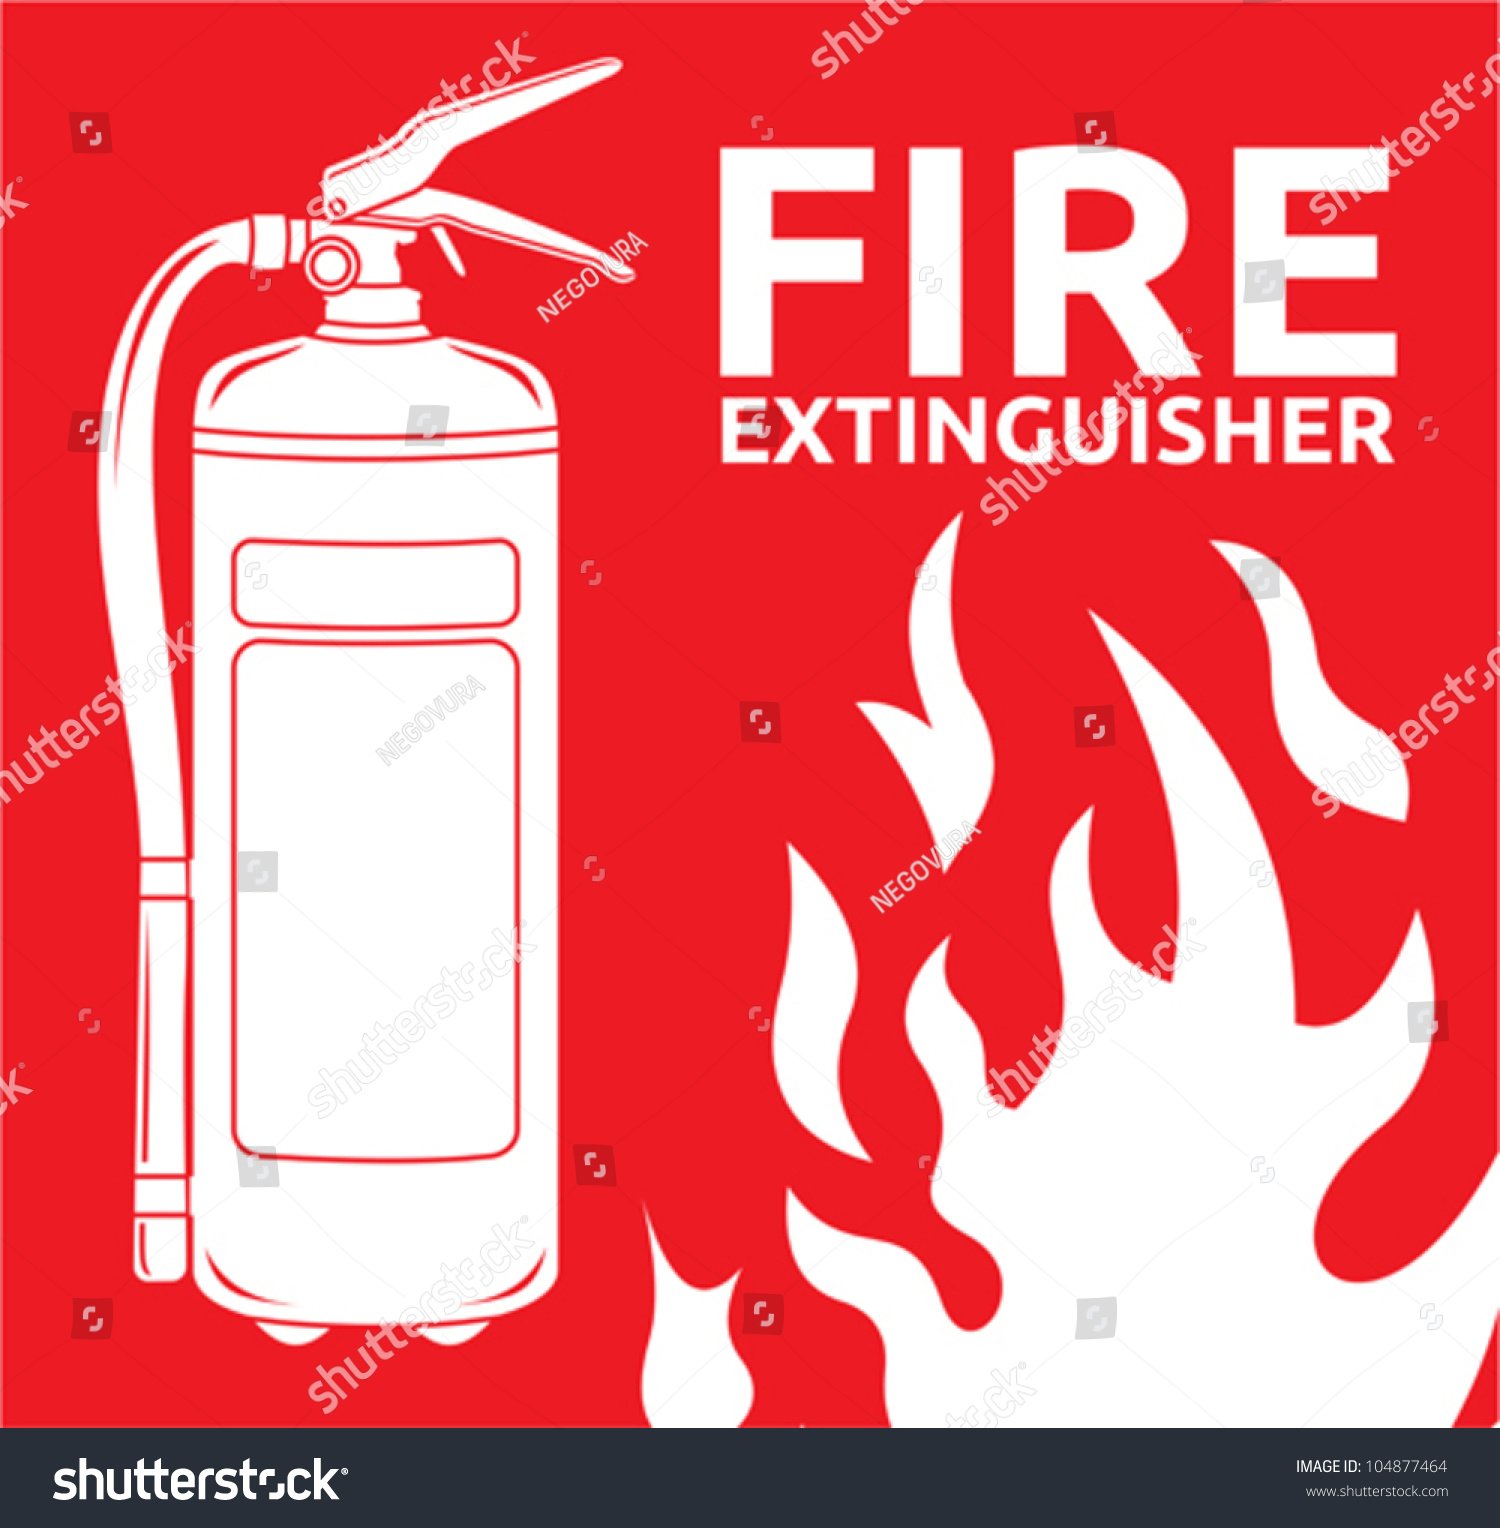 fire extinguisher sign stock vector illustration 104877464